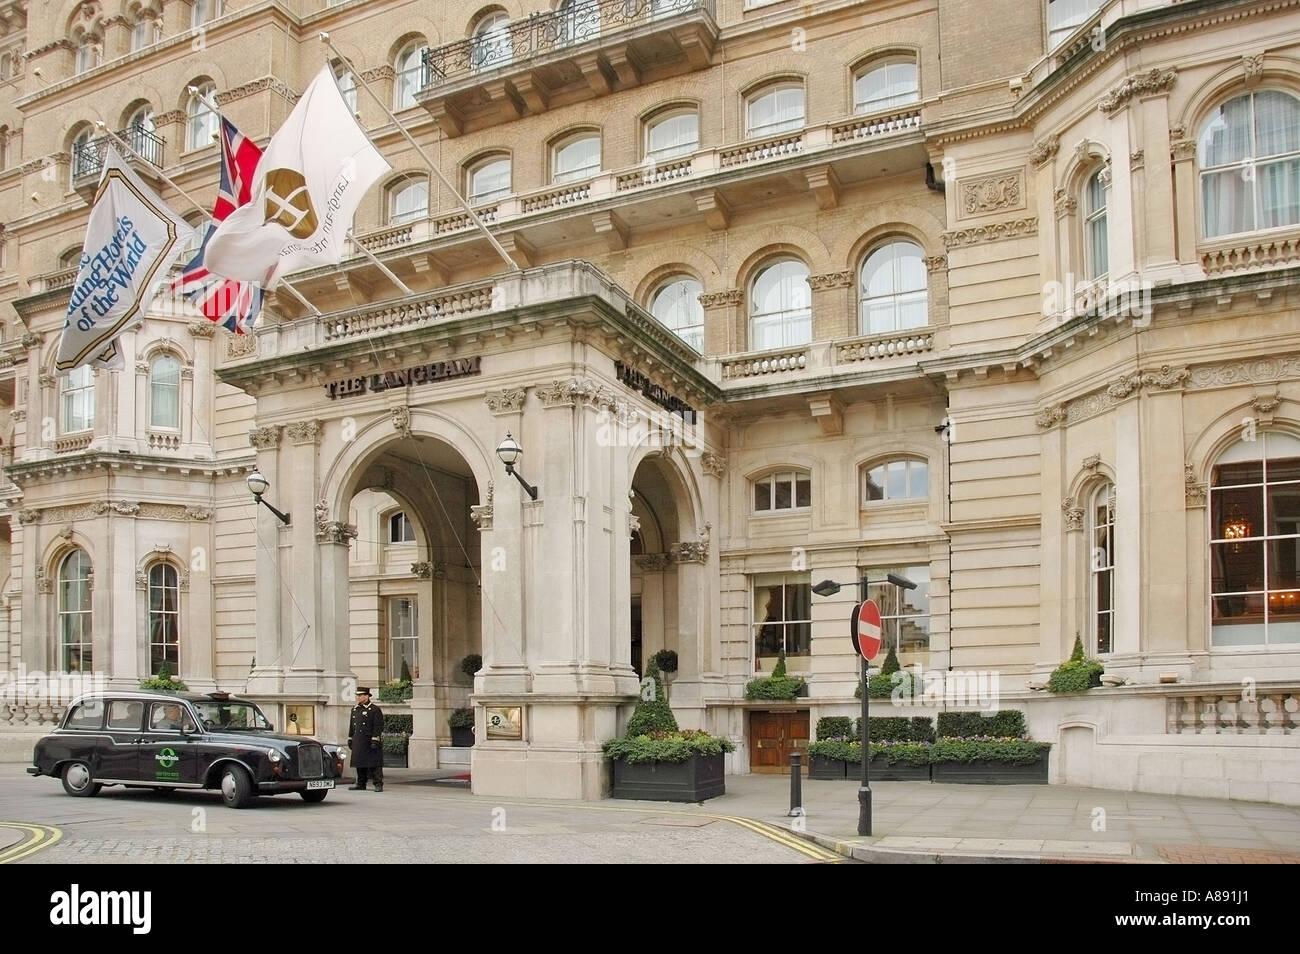 Langham Hotel luxurious, historical architecture, London,  Great Britain, UK, England, GB, Europe, EU - Stock Image